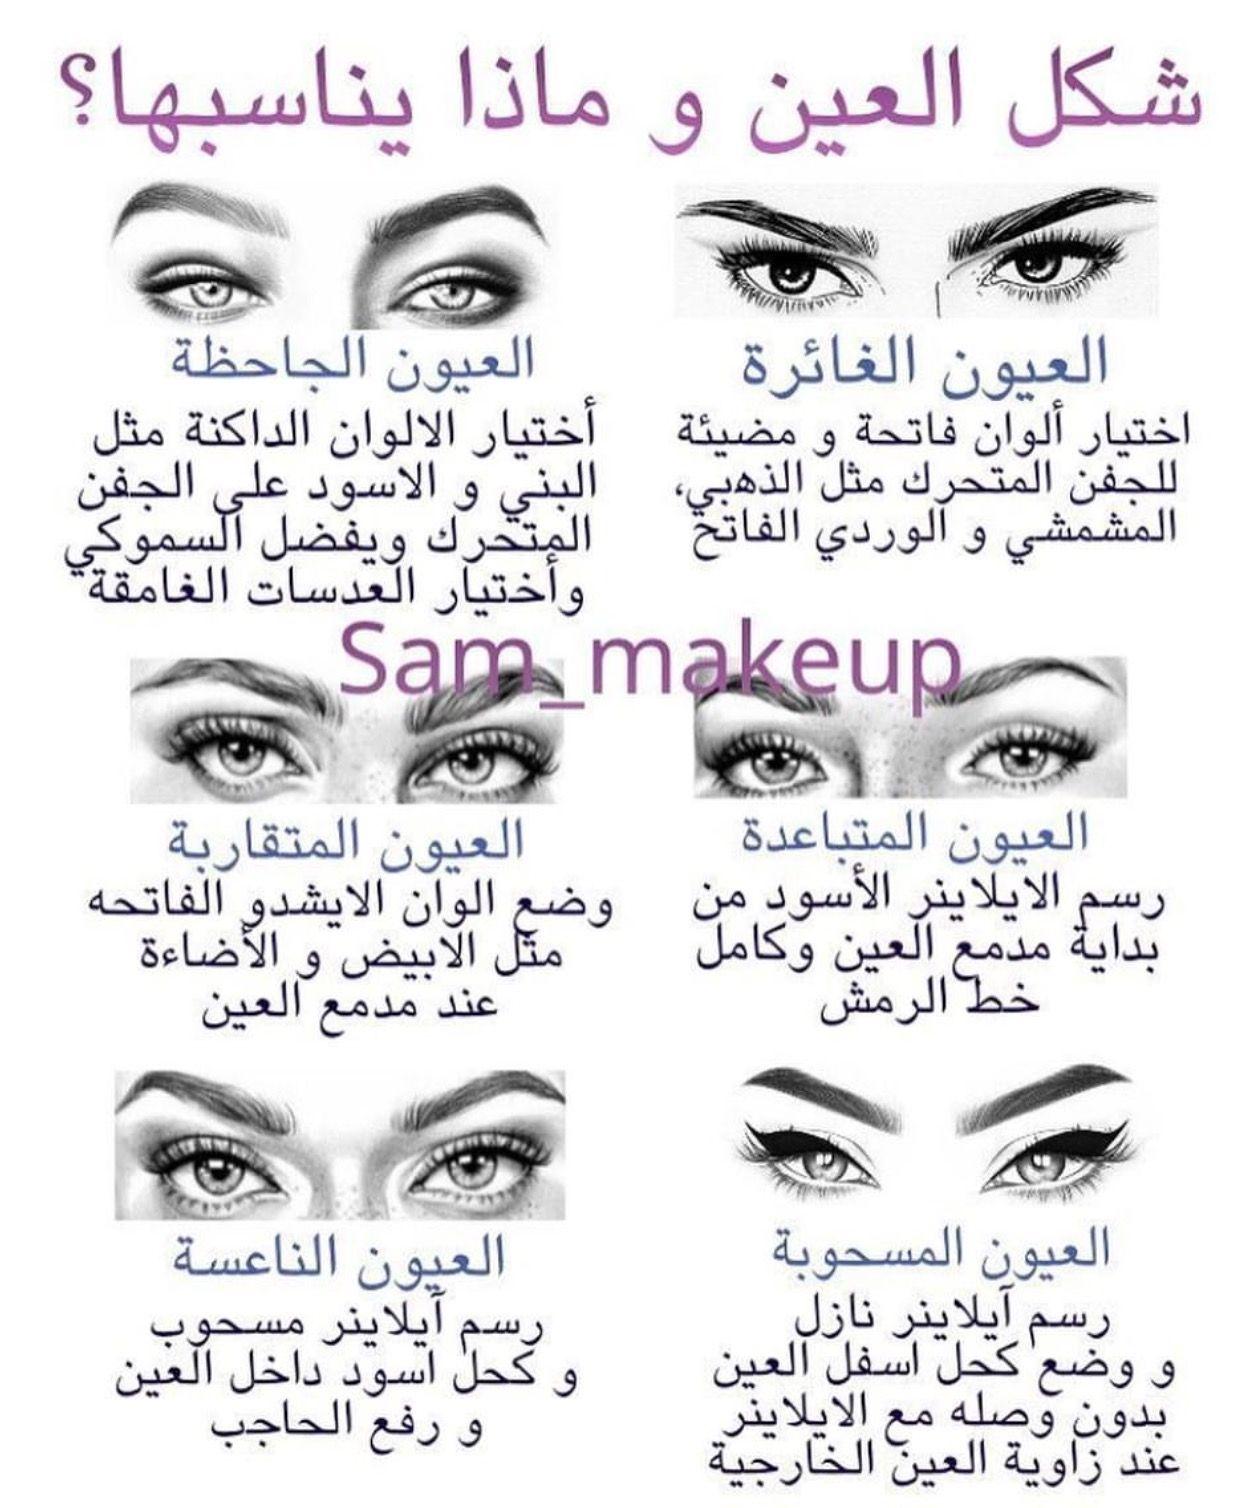 Pin By Helwa Shraim On مكياج Pinterest Makeup Makeup Skin Makeup